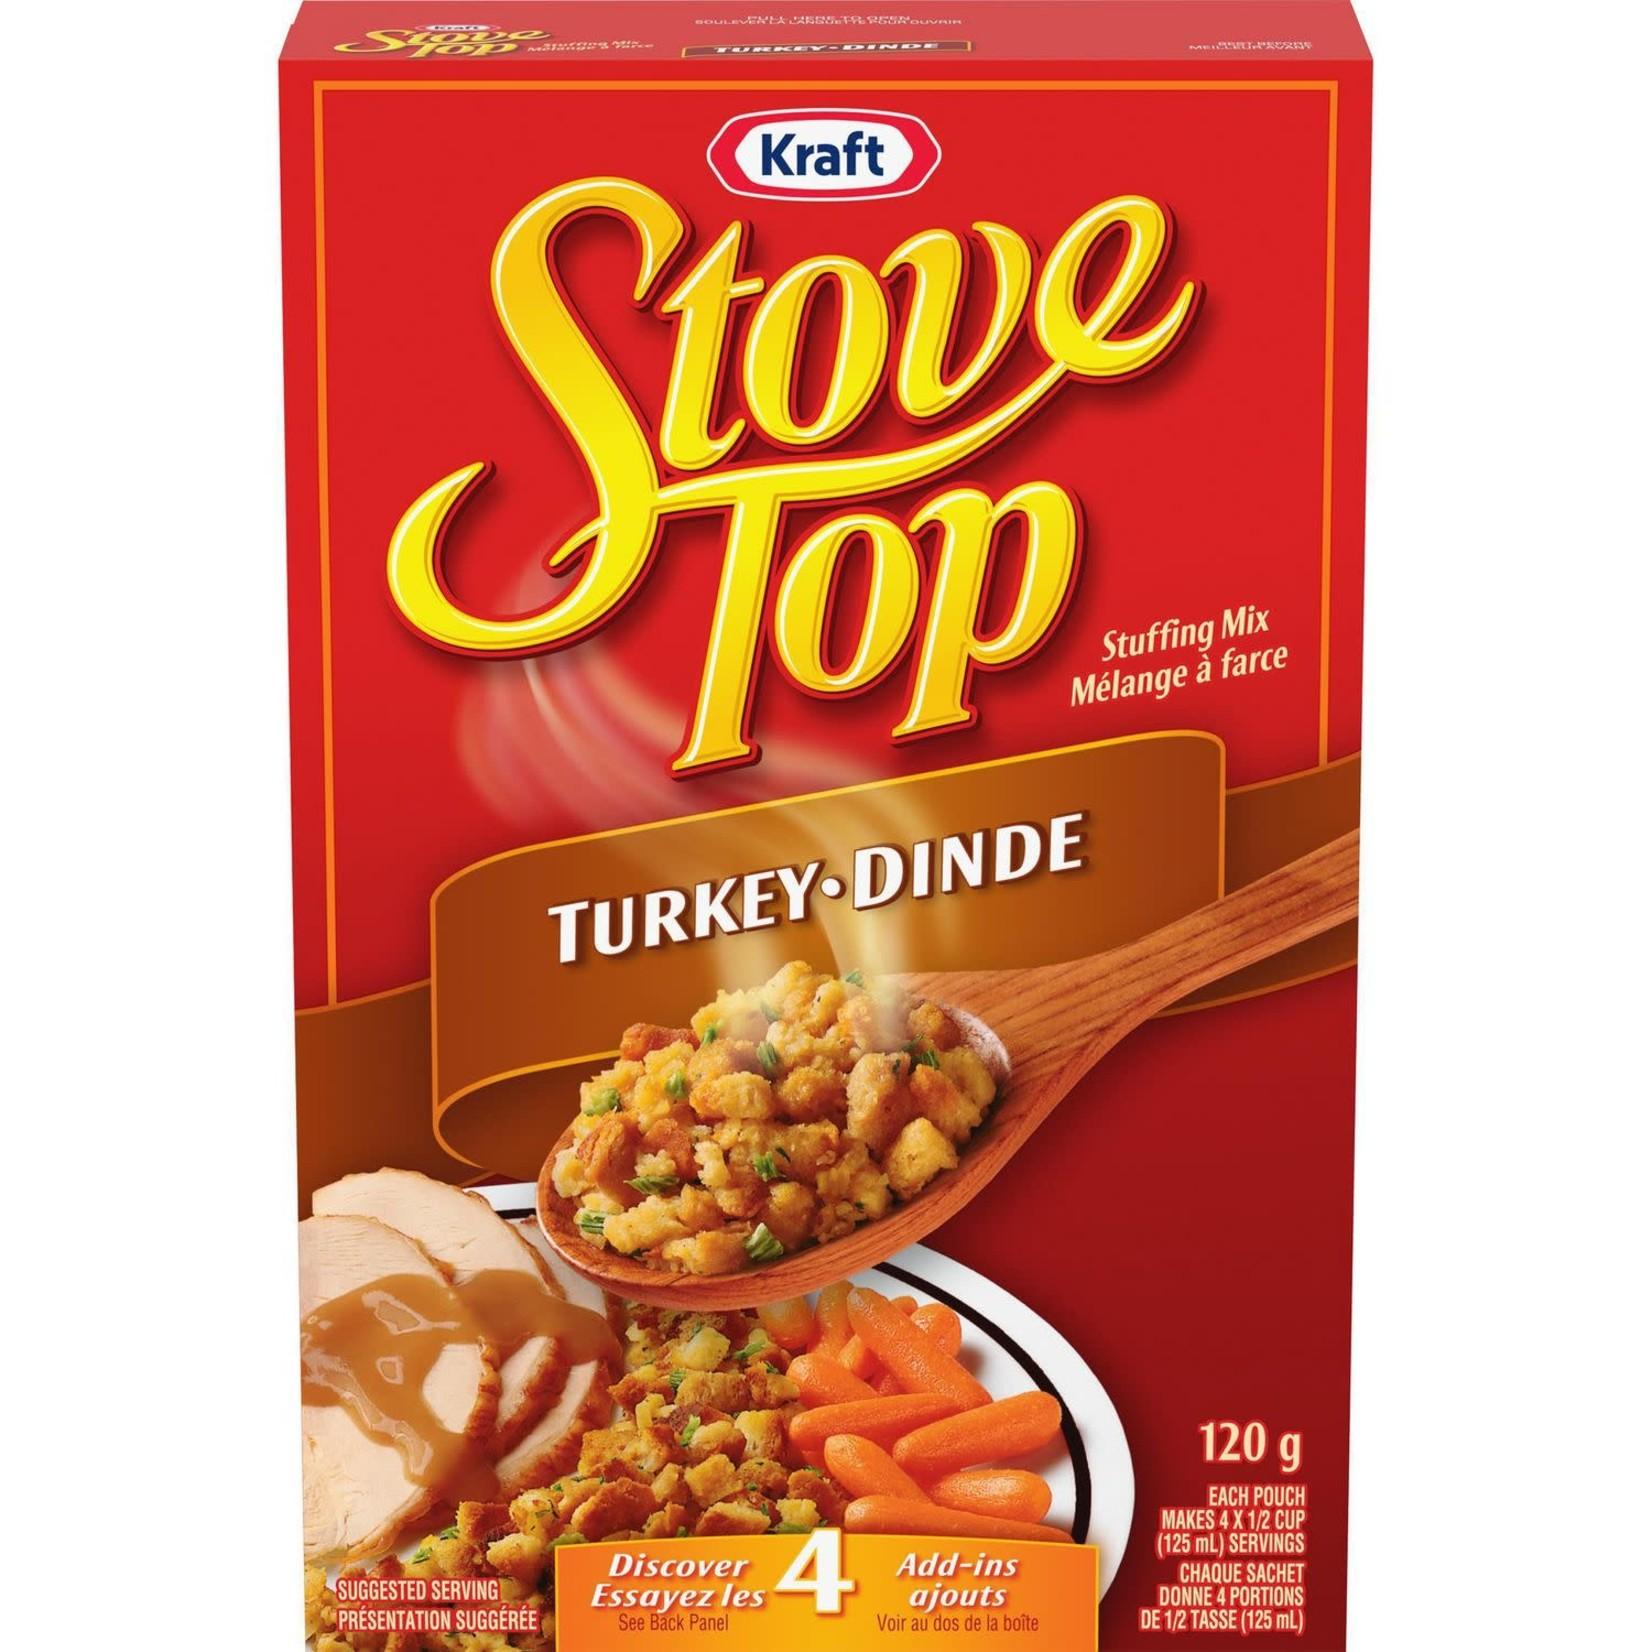 Stove Top Stuffing -Turkey